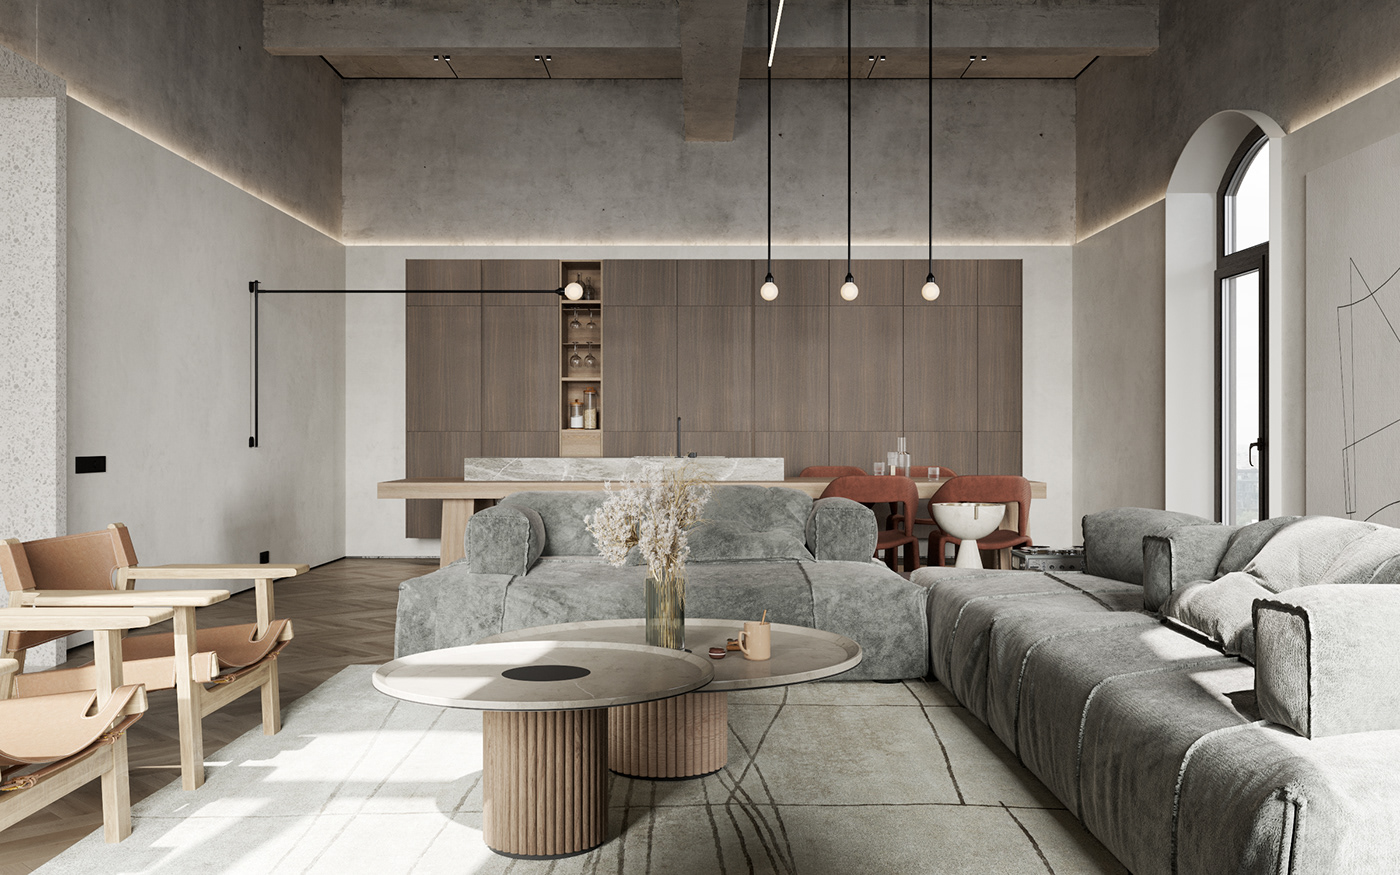 cartelledesign design Interior LOFT moderninterior дизайнинтерьера